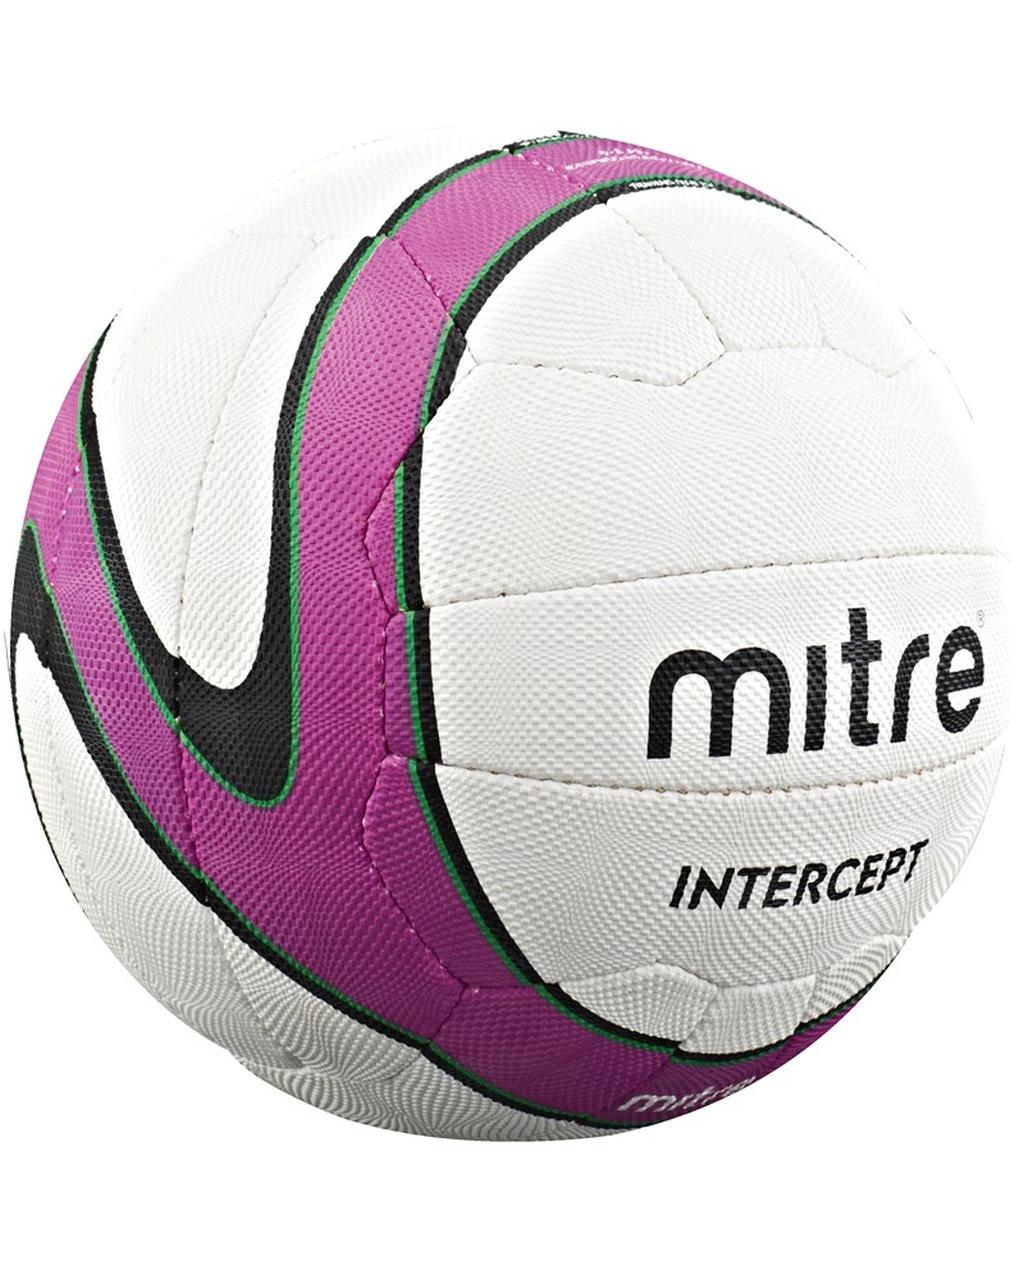 Mitre Intercept Netball Size 5